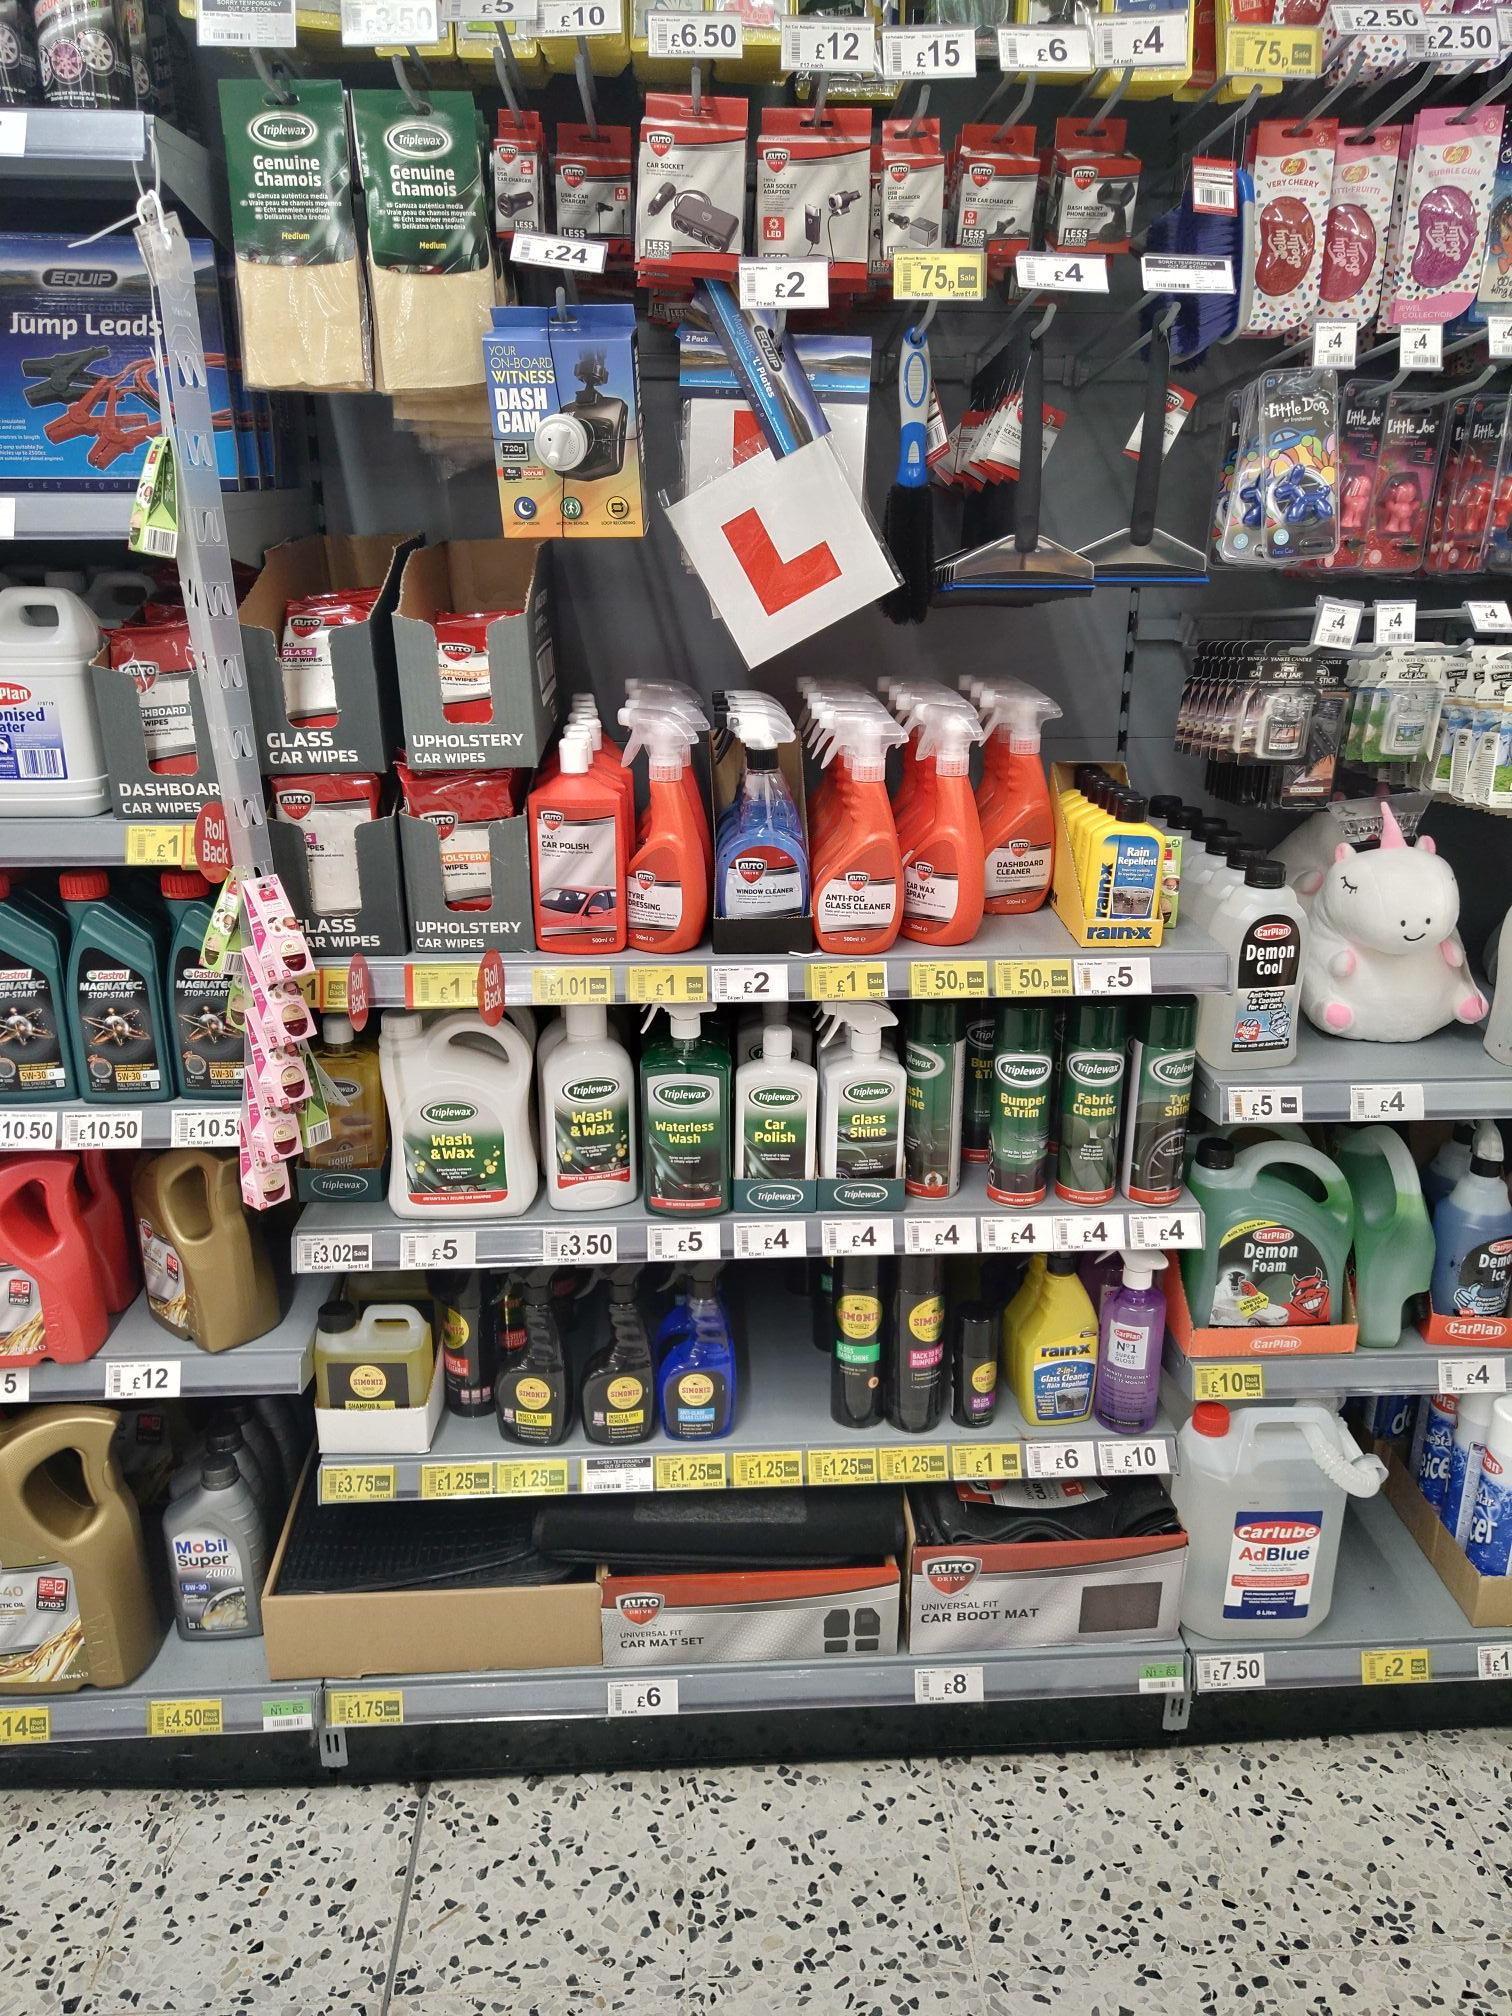 Lots of Car Cleaning Kit discounted by up to 75% at Asda / Simoniz Glass Clean Anti Glare 500ml £1.25  /  Simoniz Shampoo Wax 1L £3.75